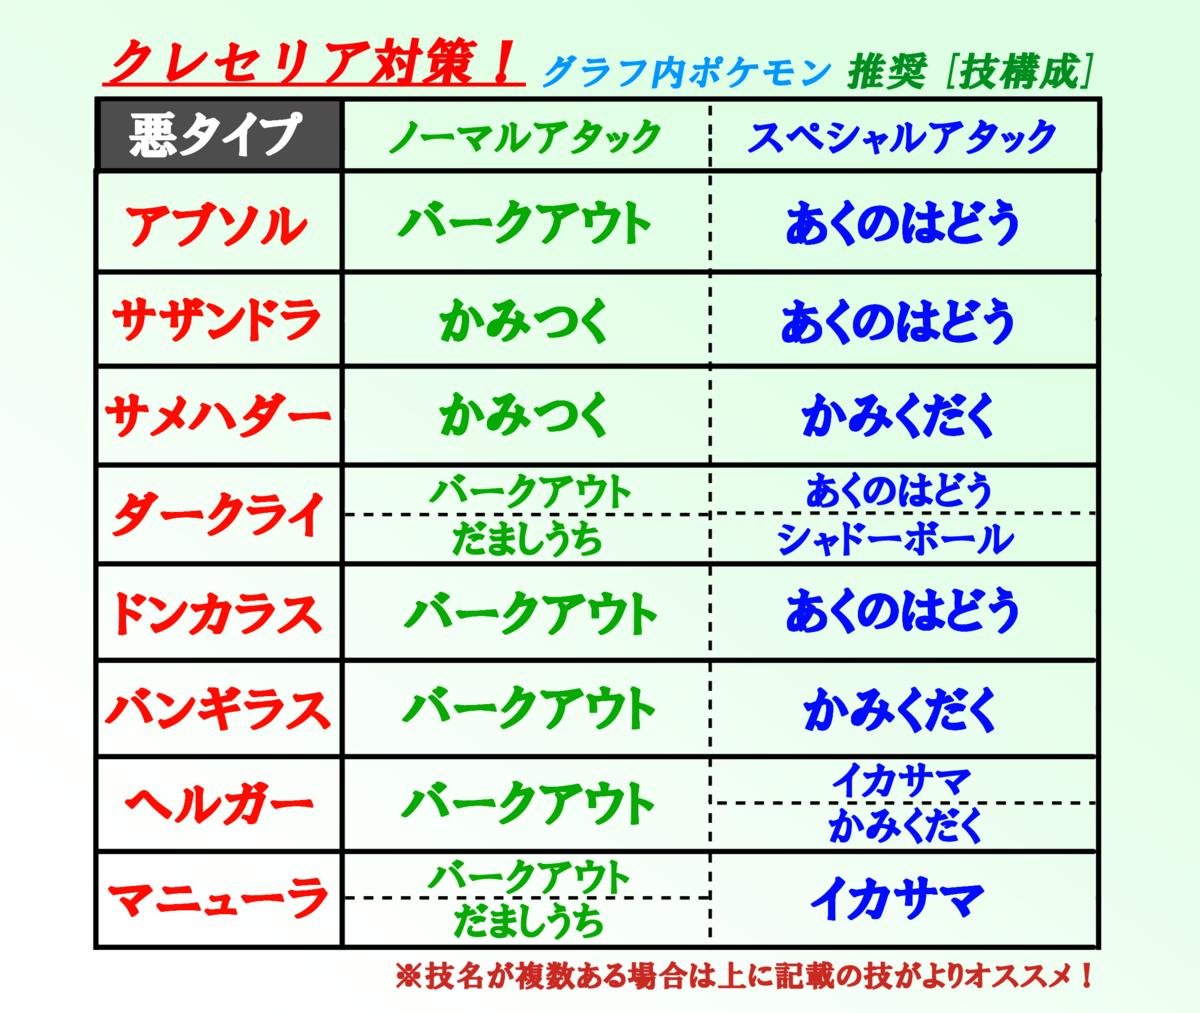 f:id:Kazumin0331:20200910002551p:plain